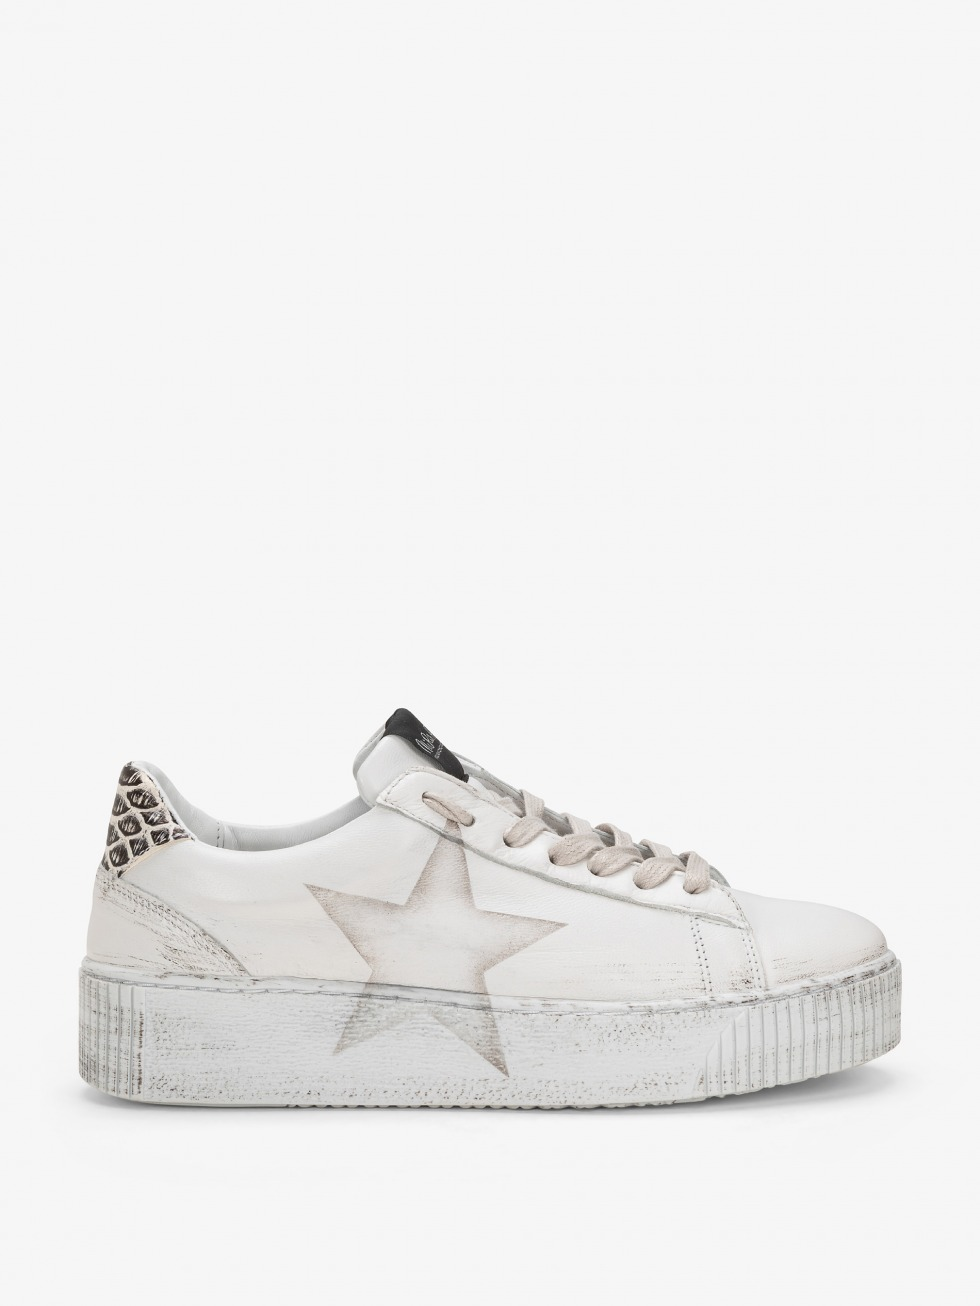 Cosmopolitan Sneakers - Black Cobra Star